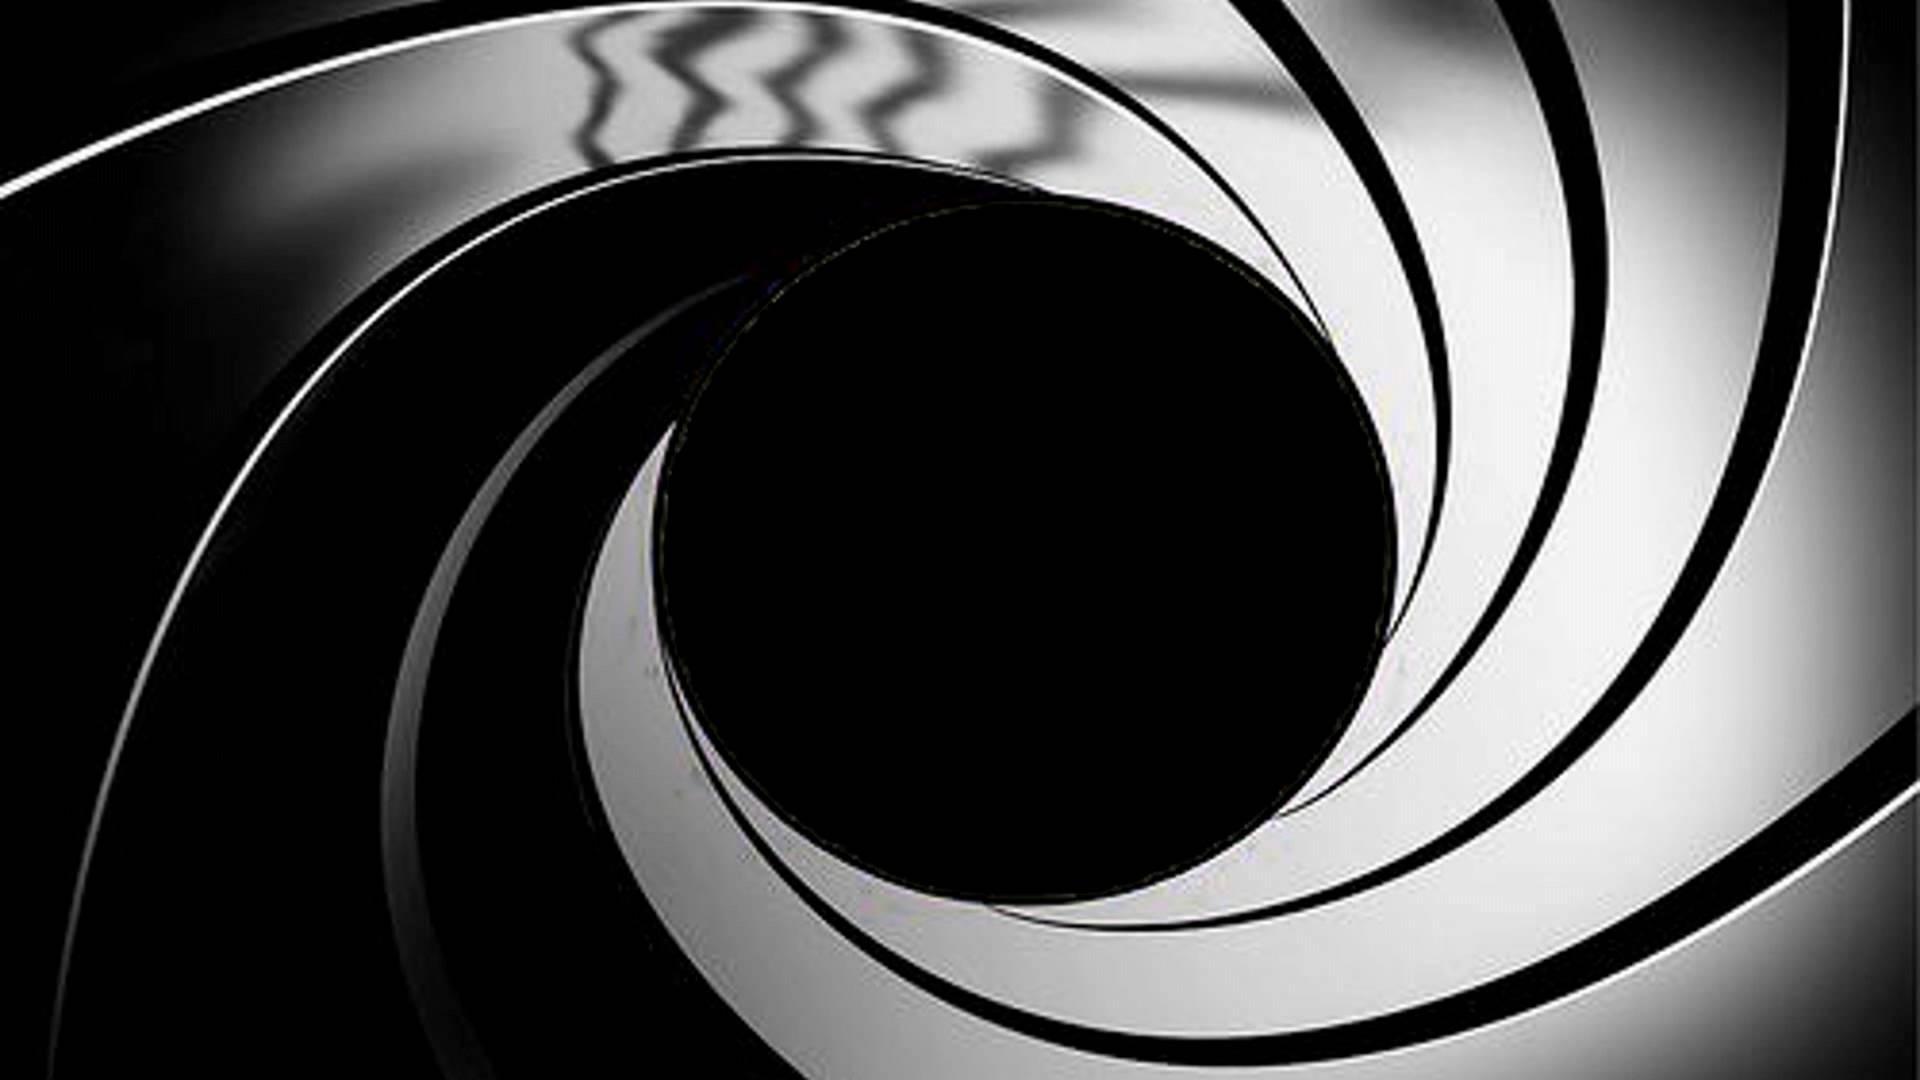 James Bond 007 Blank Gunbarrel Test 1920x1080